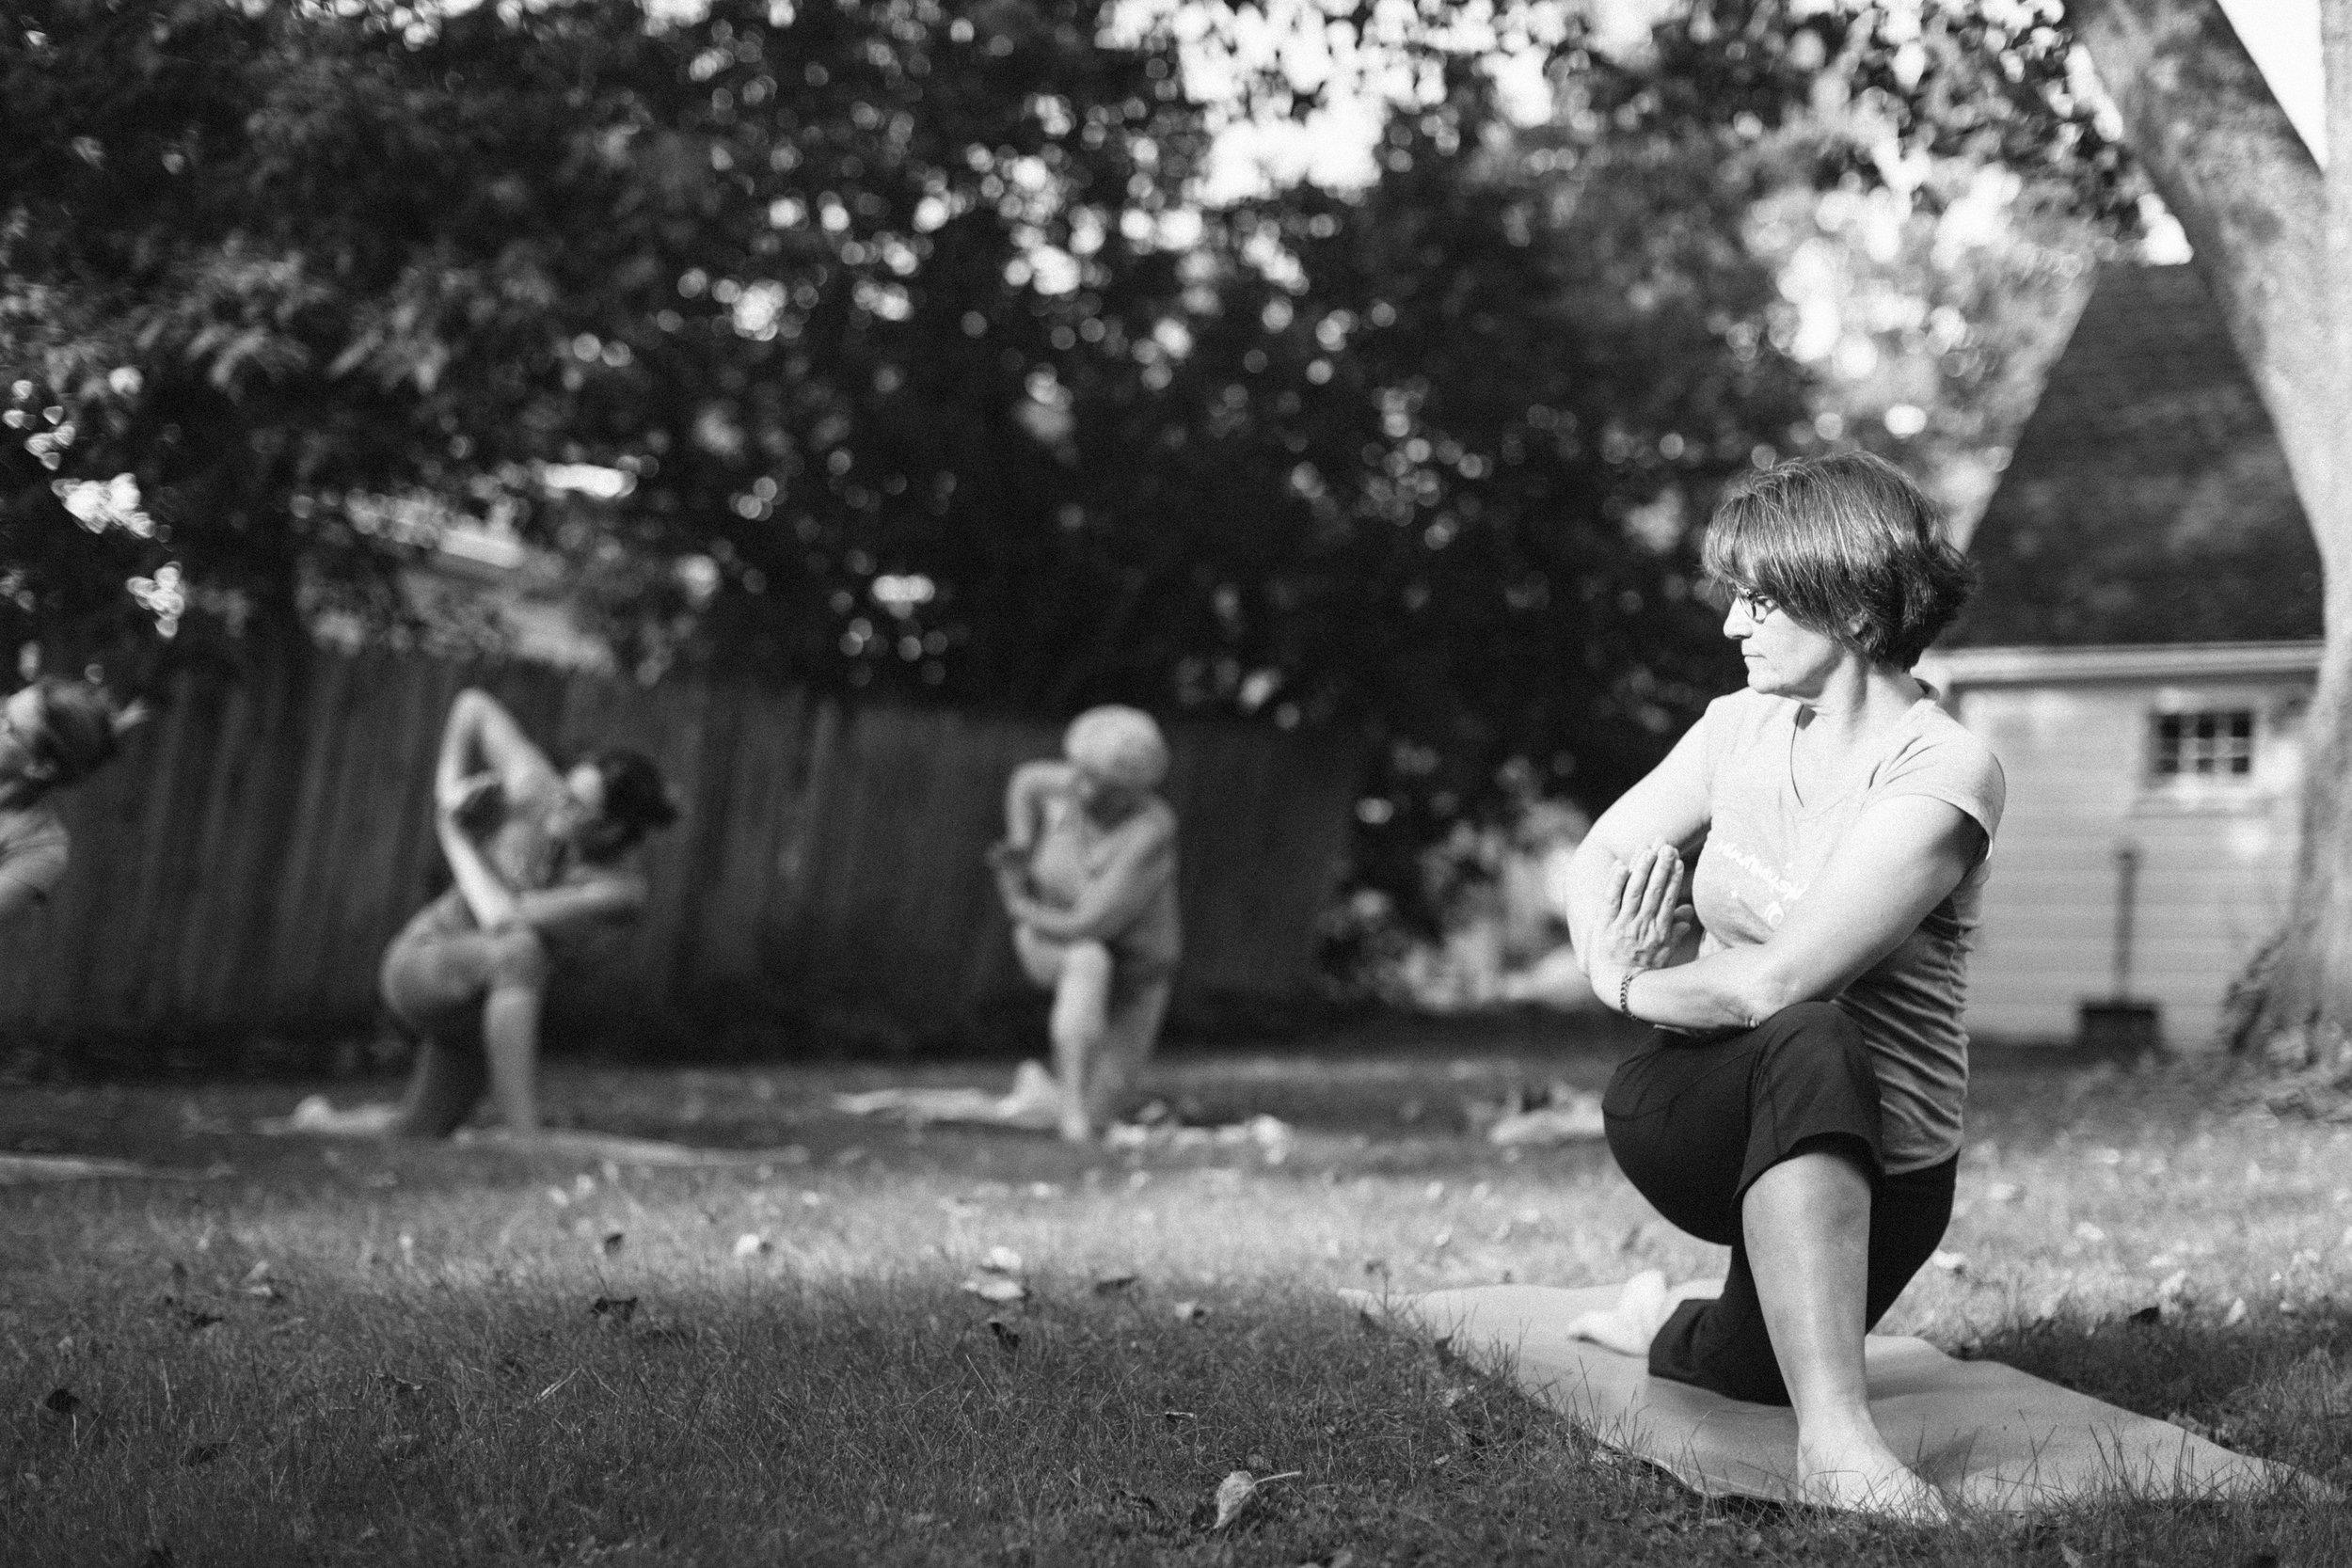 002-Outdoor-Yard-Yoga-Classes-Medford-Wisconsin-2.jpg